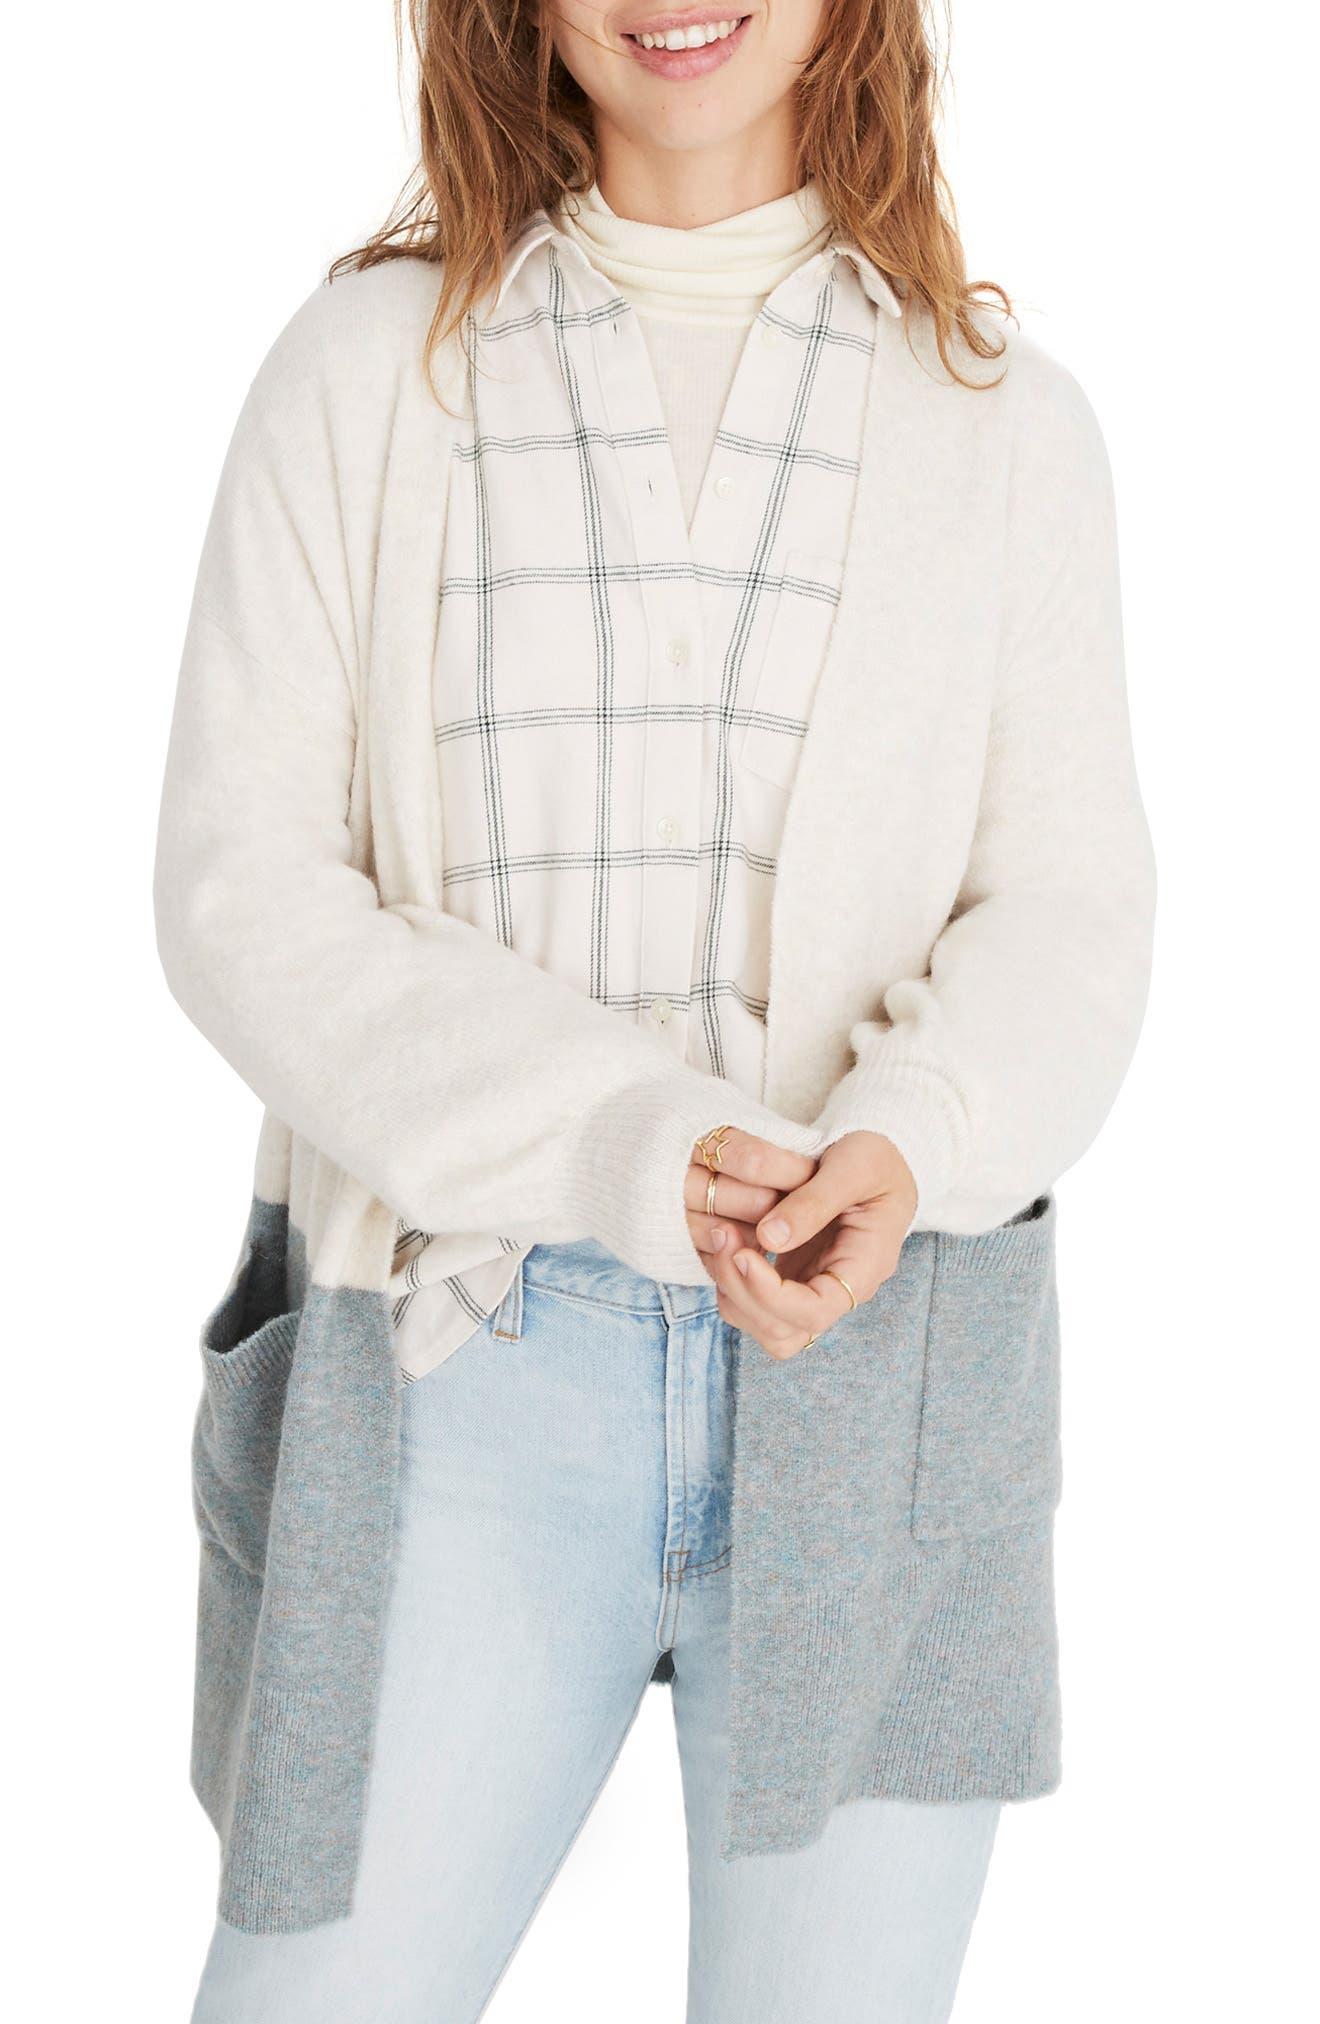 Kent Colorblock Cardigan Sweater,                         Main,                         color, HEATHER RIVER